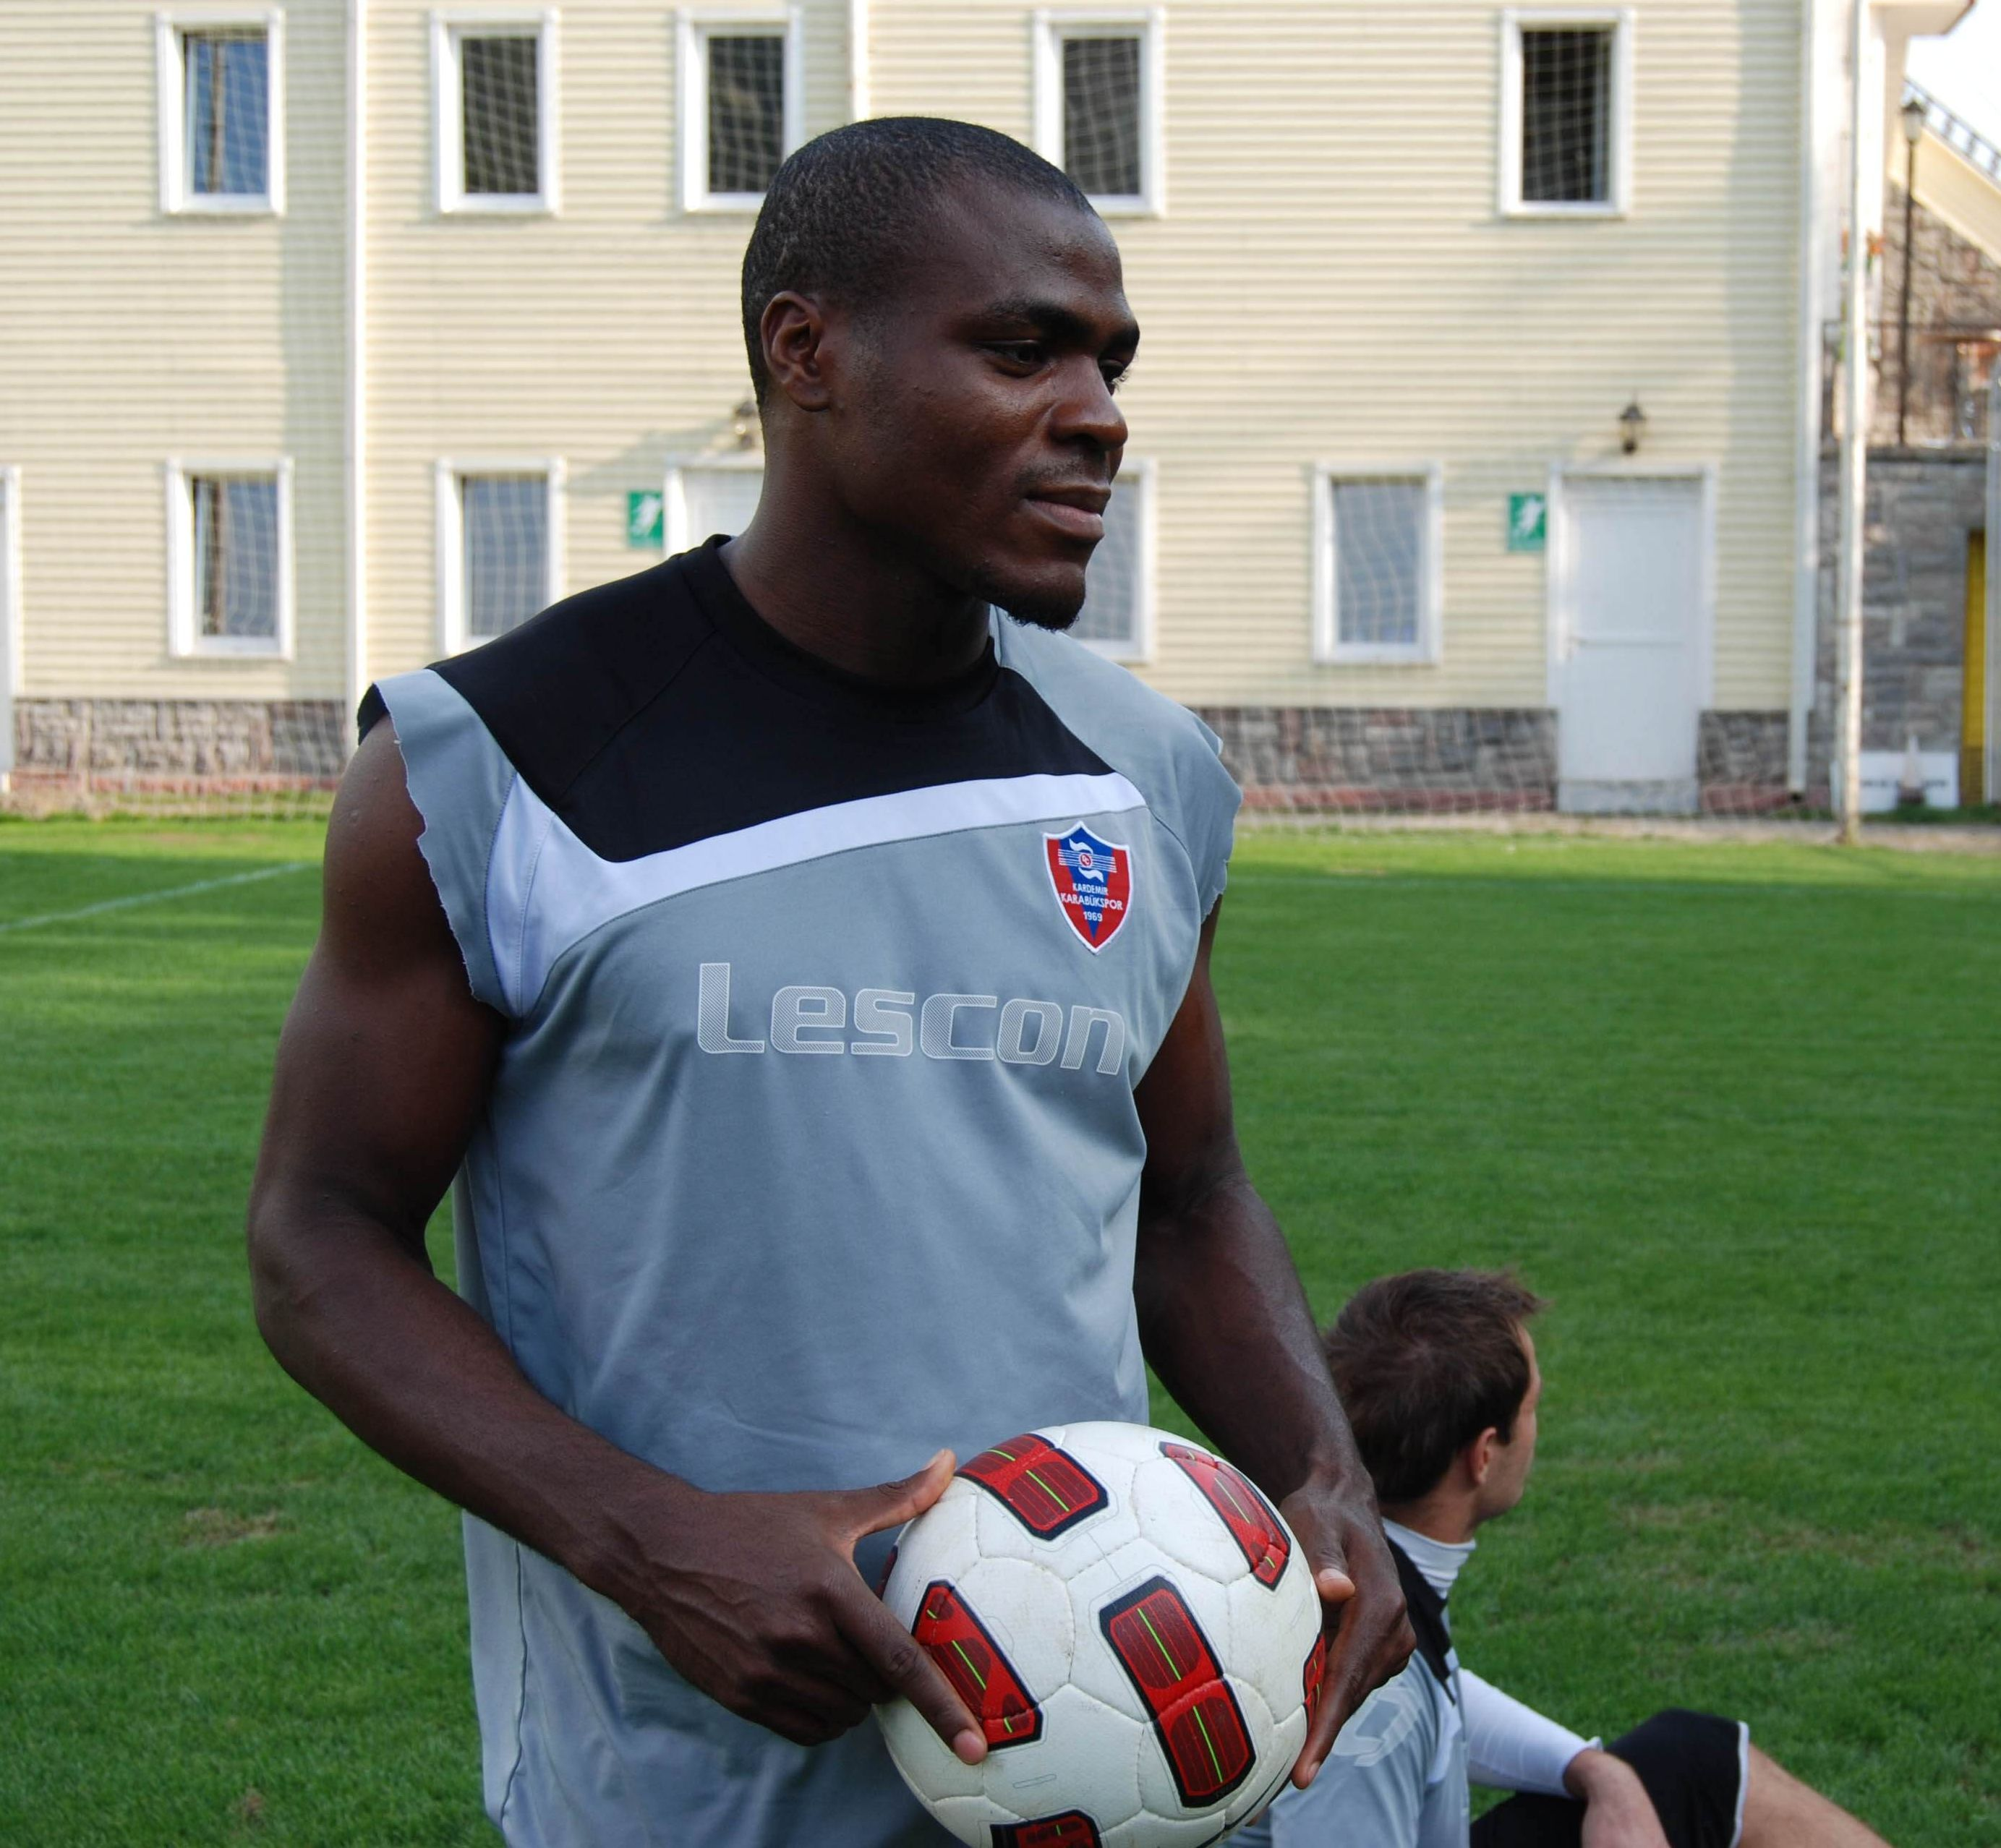 Emenike May Rejoin Former Club Karabukspor plete Sports Nigeria